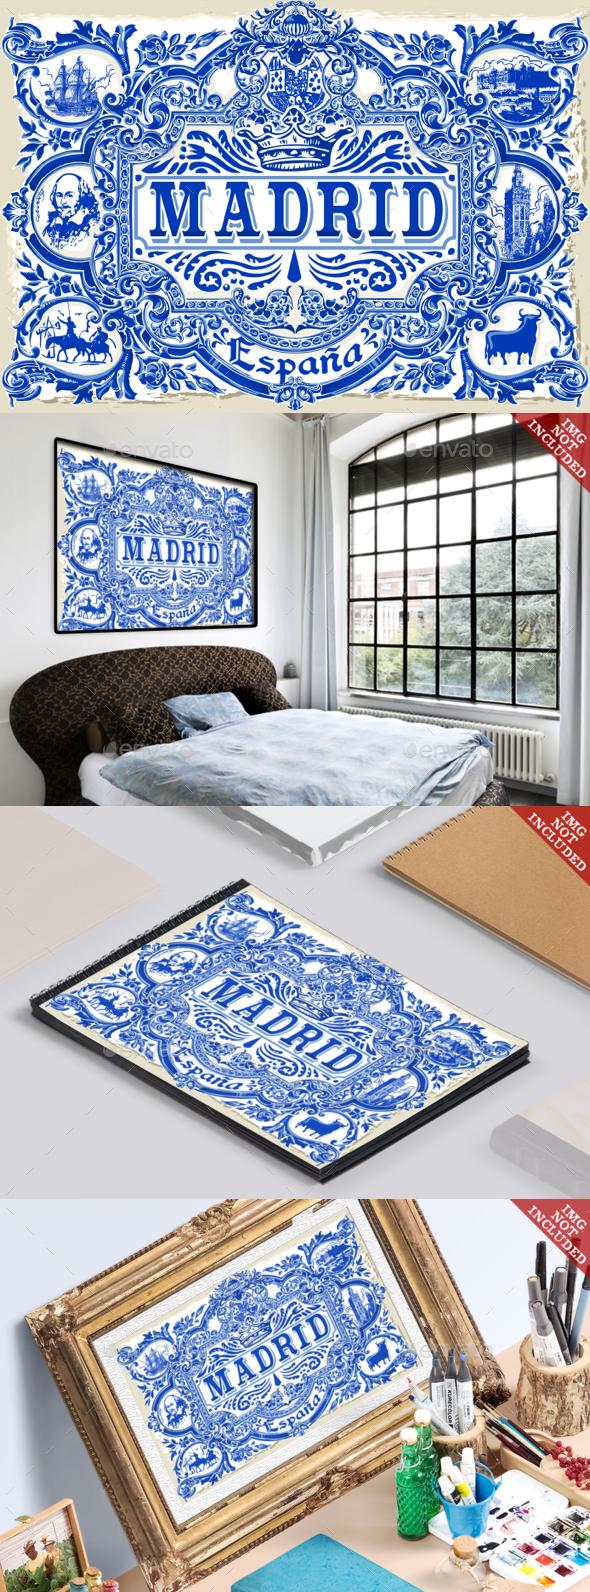 Madrid Azulejos Vintage 2D - Backgrounds Decorative